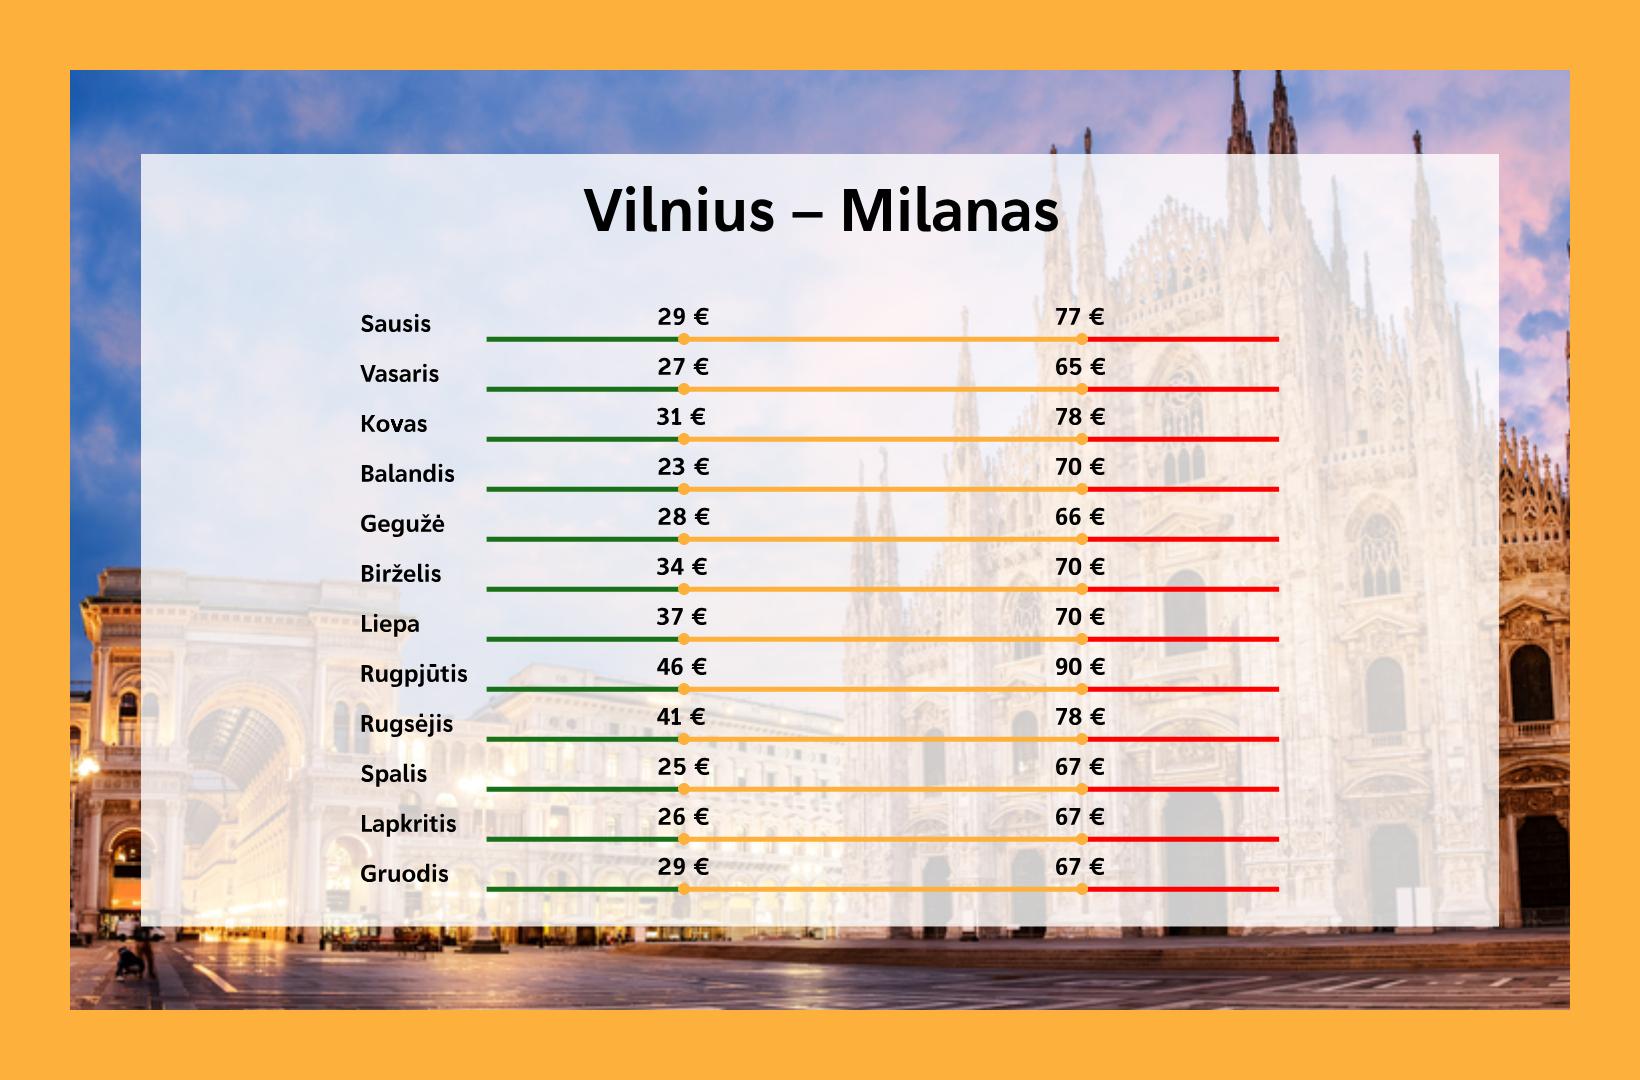 Kada pigiausi lektuvu bilietai i Milana is Vilniaus